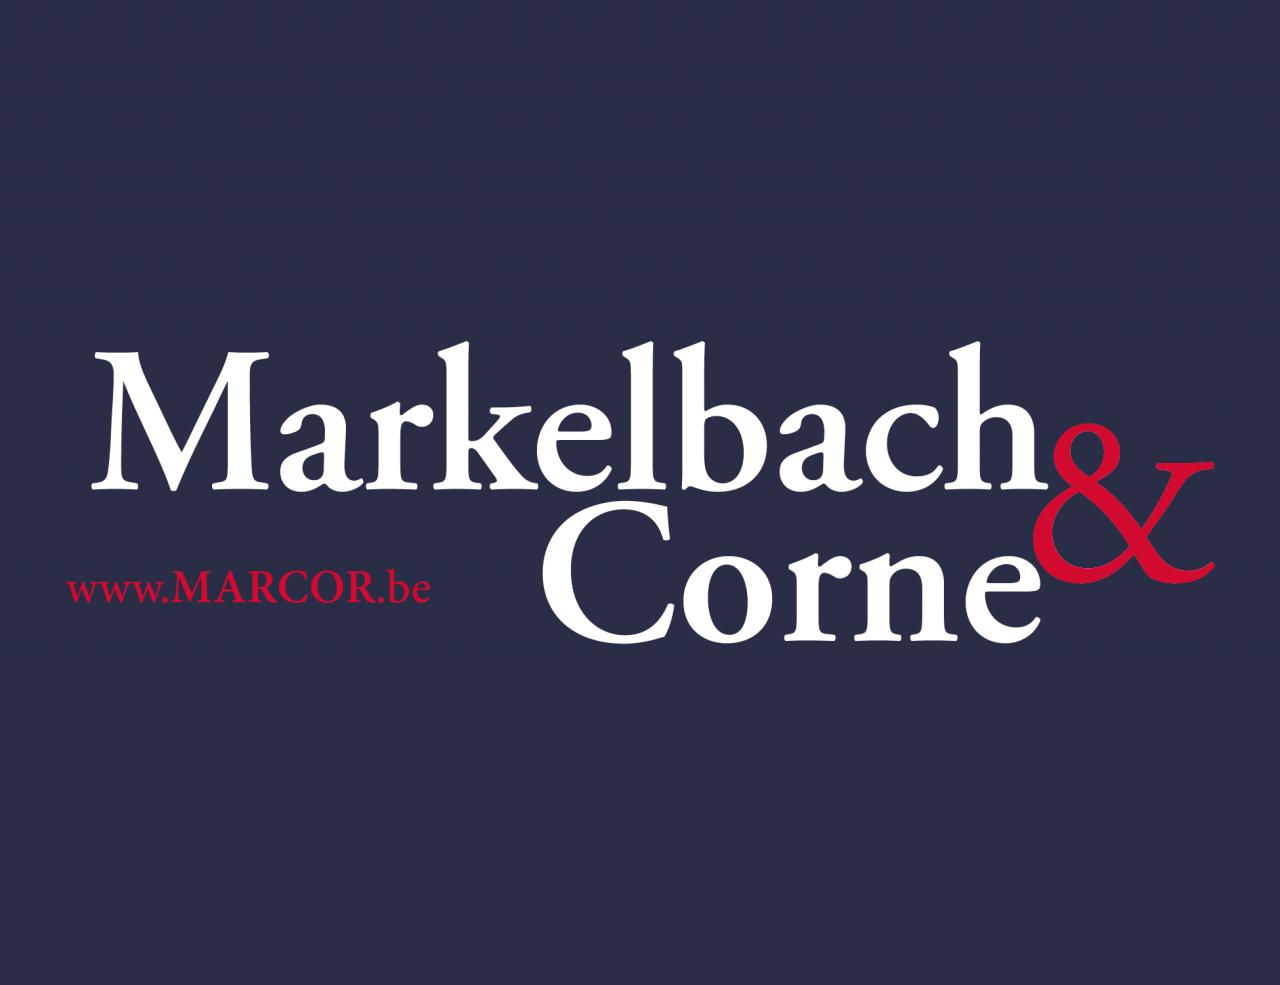 Markelbach & Corne